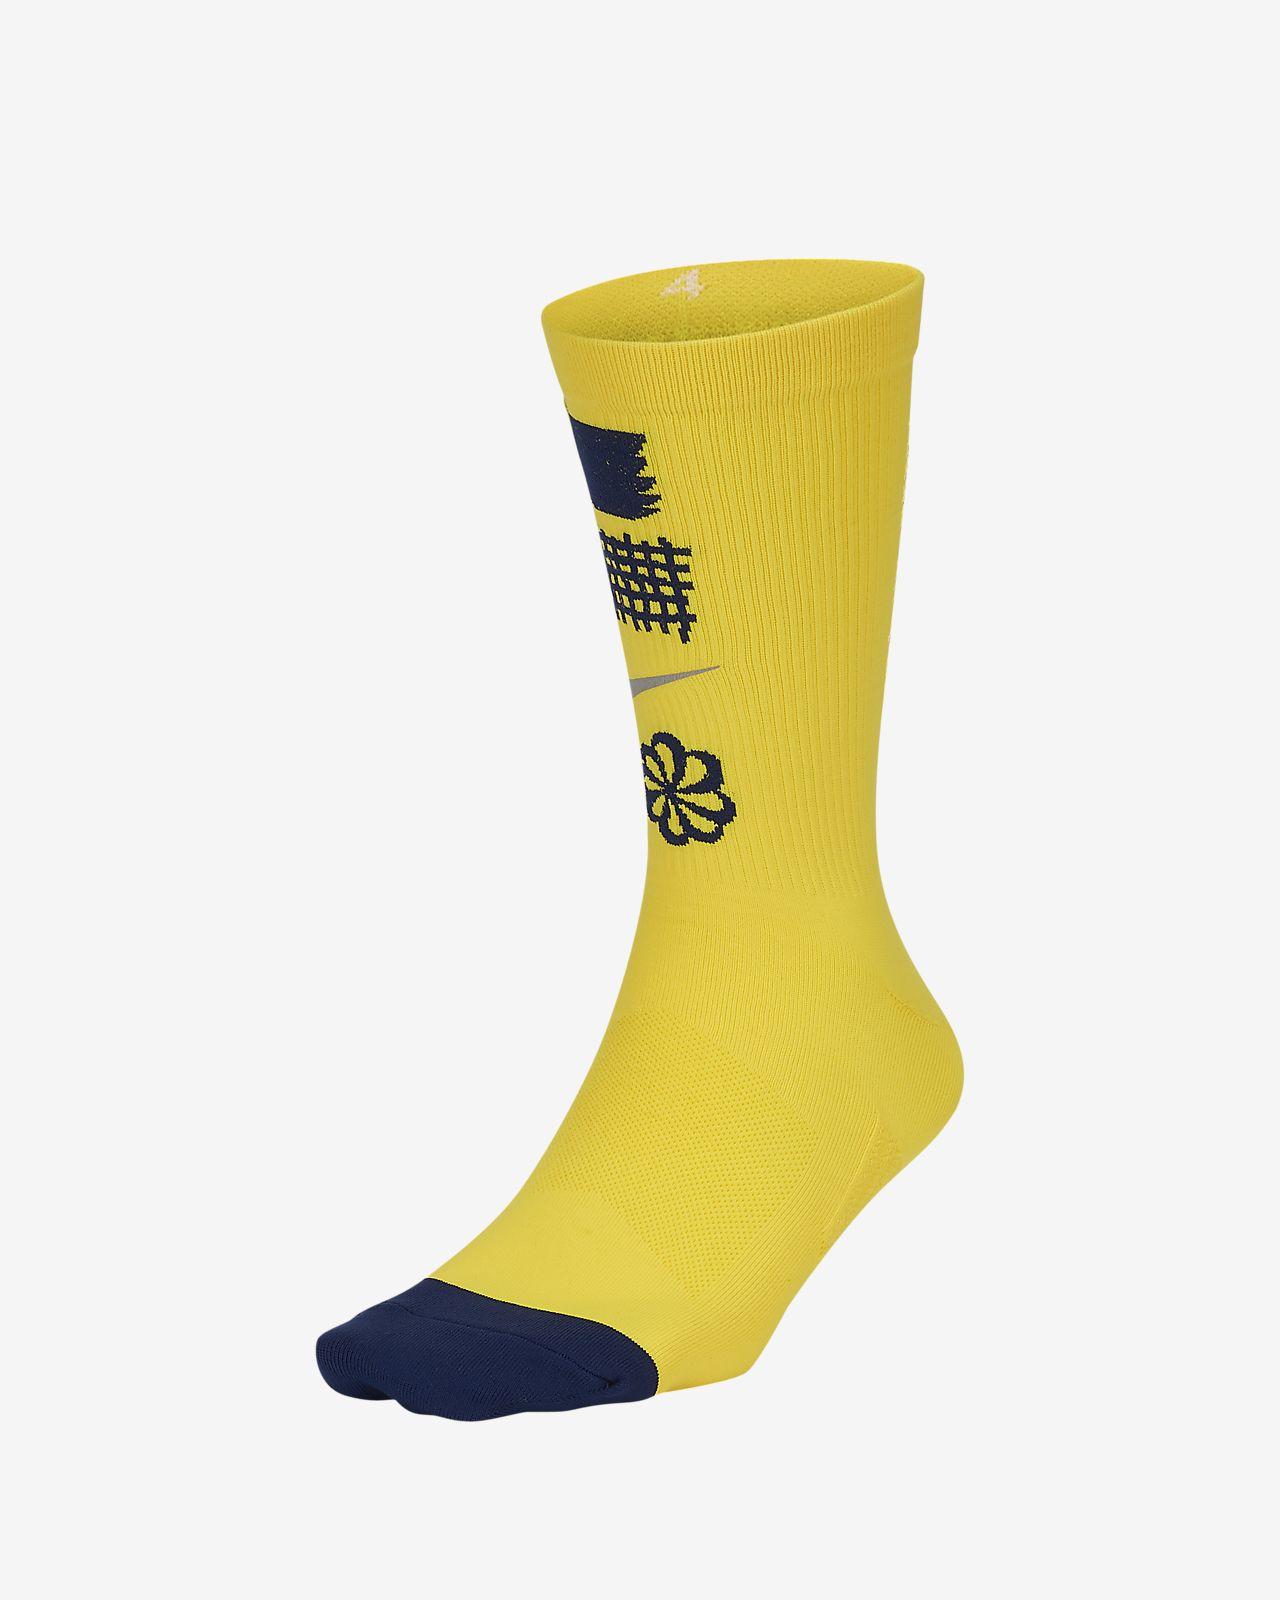 Nike Spark A.I.R. Cody Hudson Lightweight Running Crew Socks